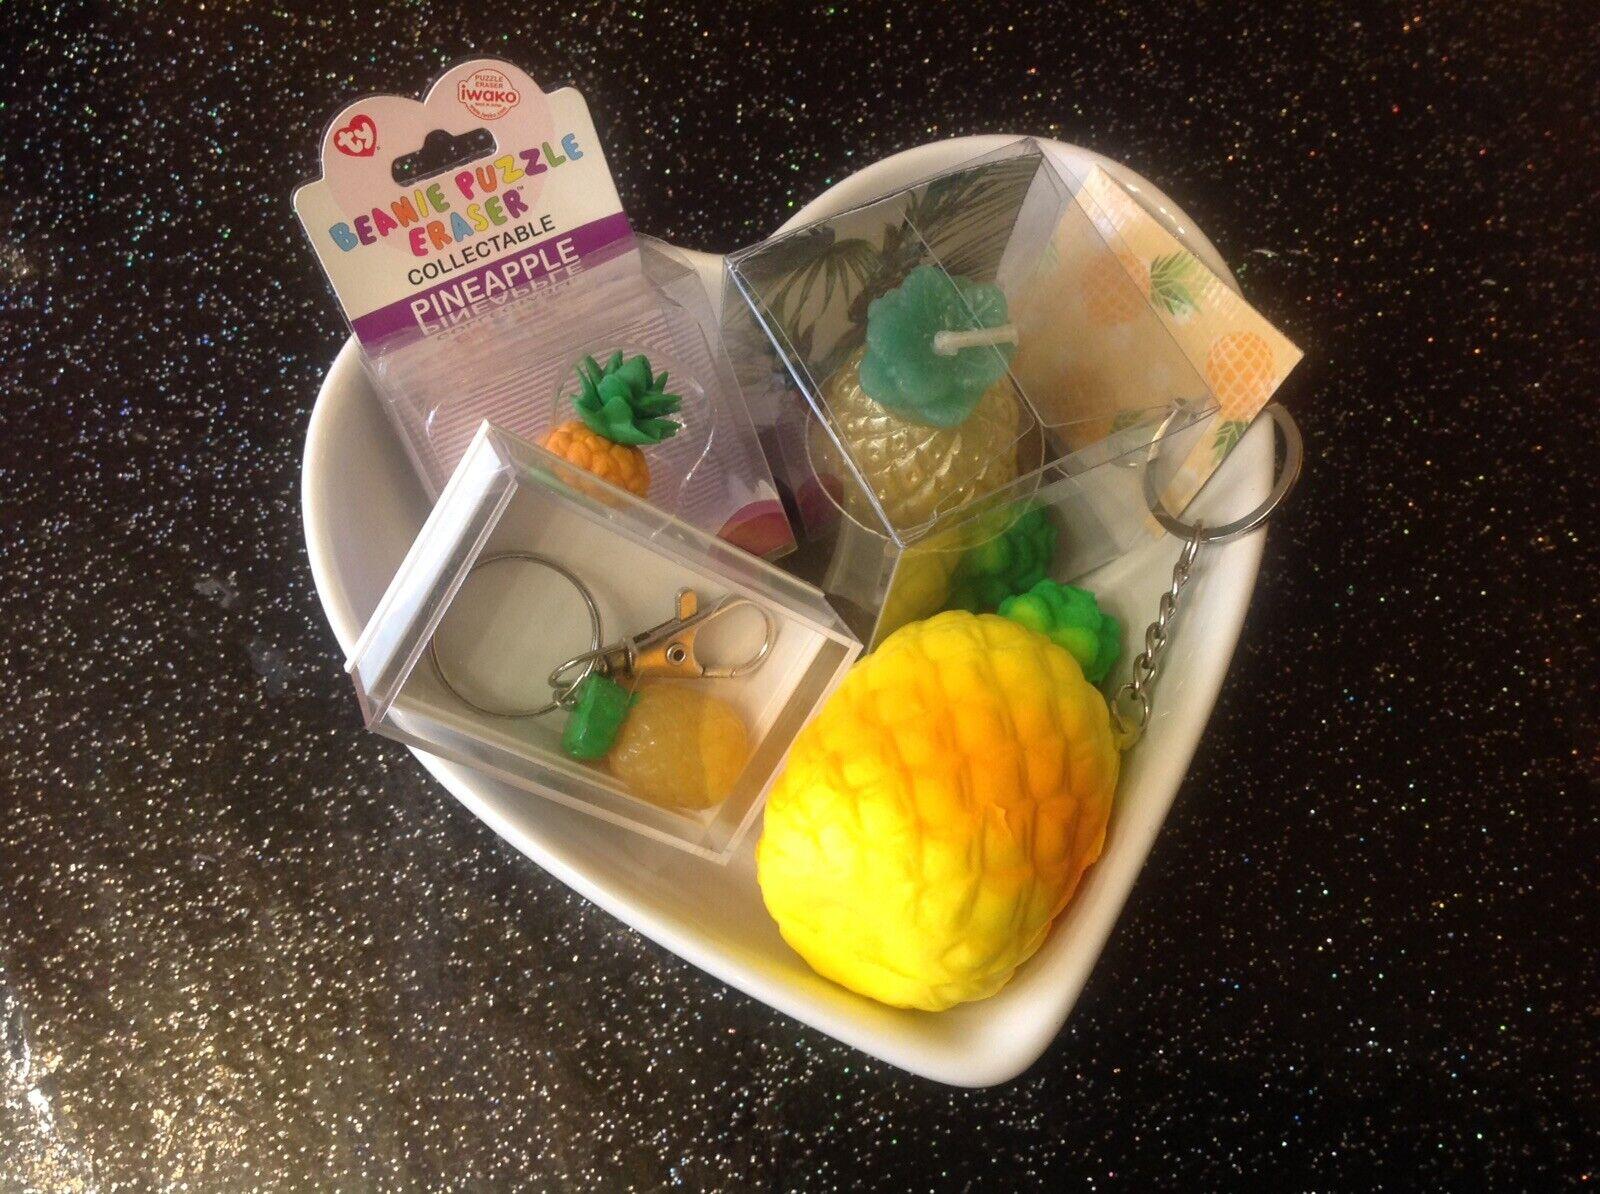 Retro Tiki Pineapple 5 Pc Gift Set Squishy Candle Keyring Eraser In Heart Dish